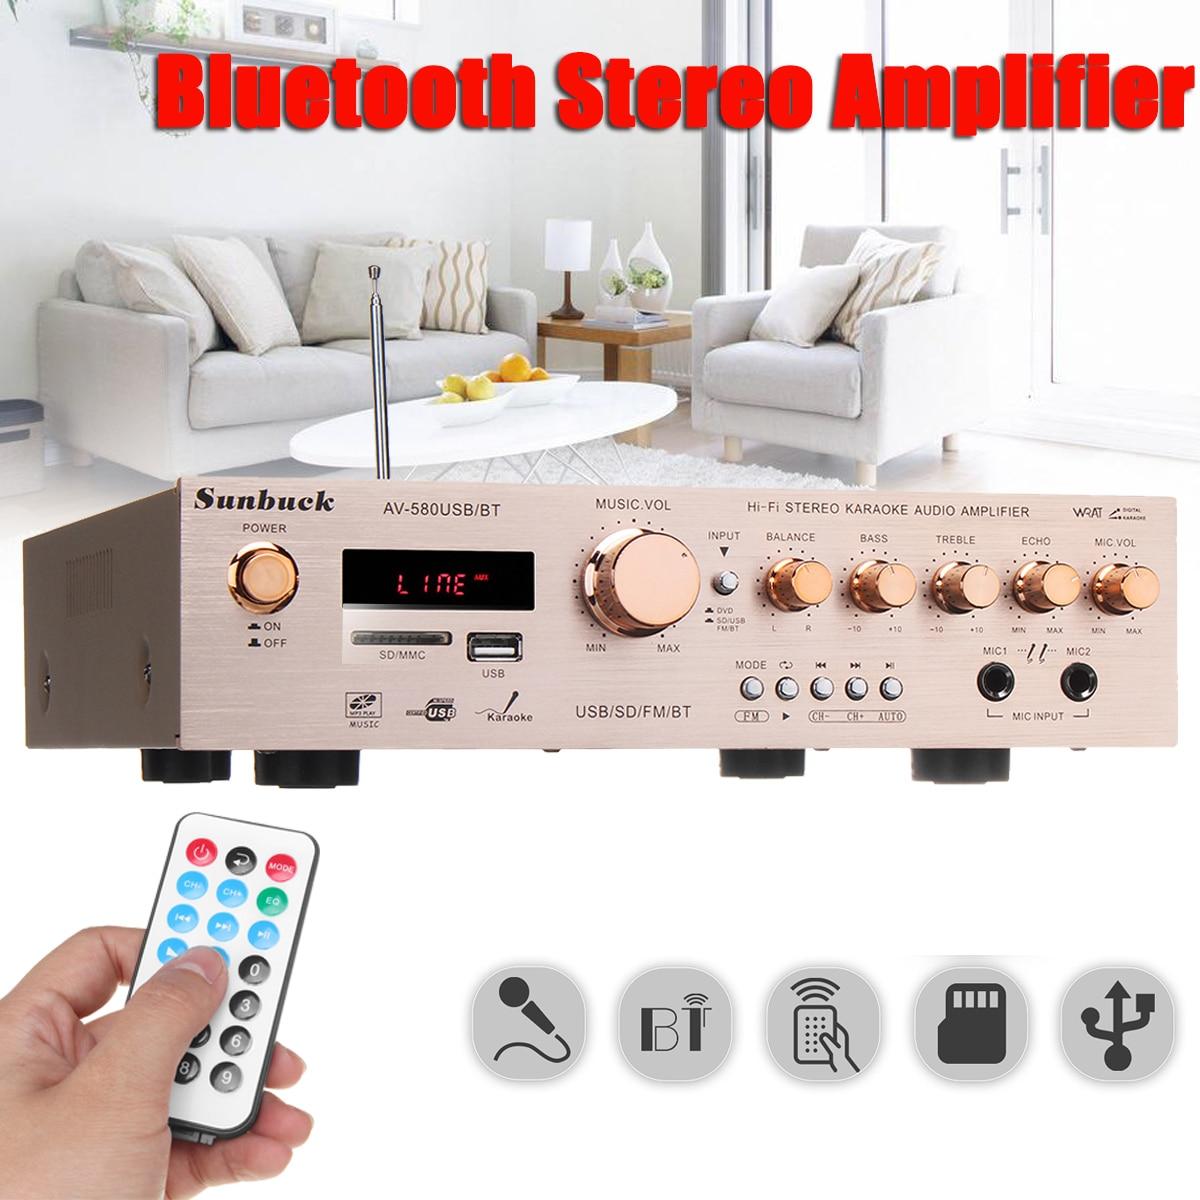 920W 220V 5CH Bluetooth HiFi Stereo AV Surround Amplifier FM Karaoke Cinema Home Home Theater Amplifiers стоимость